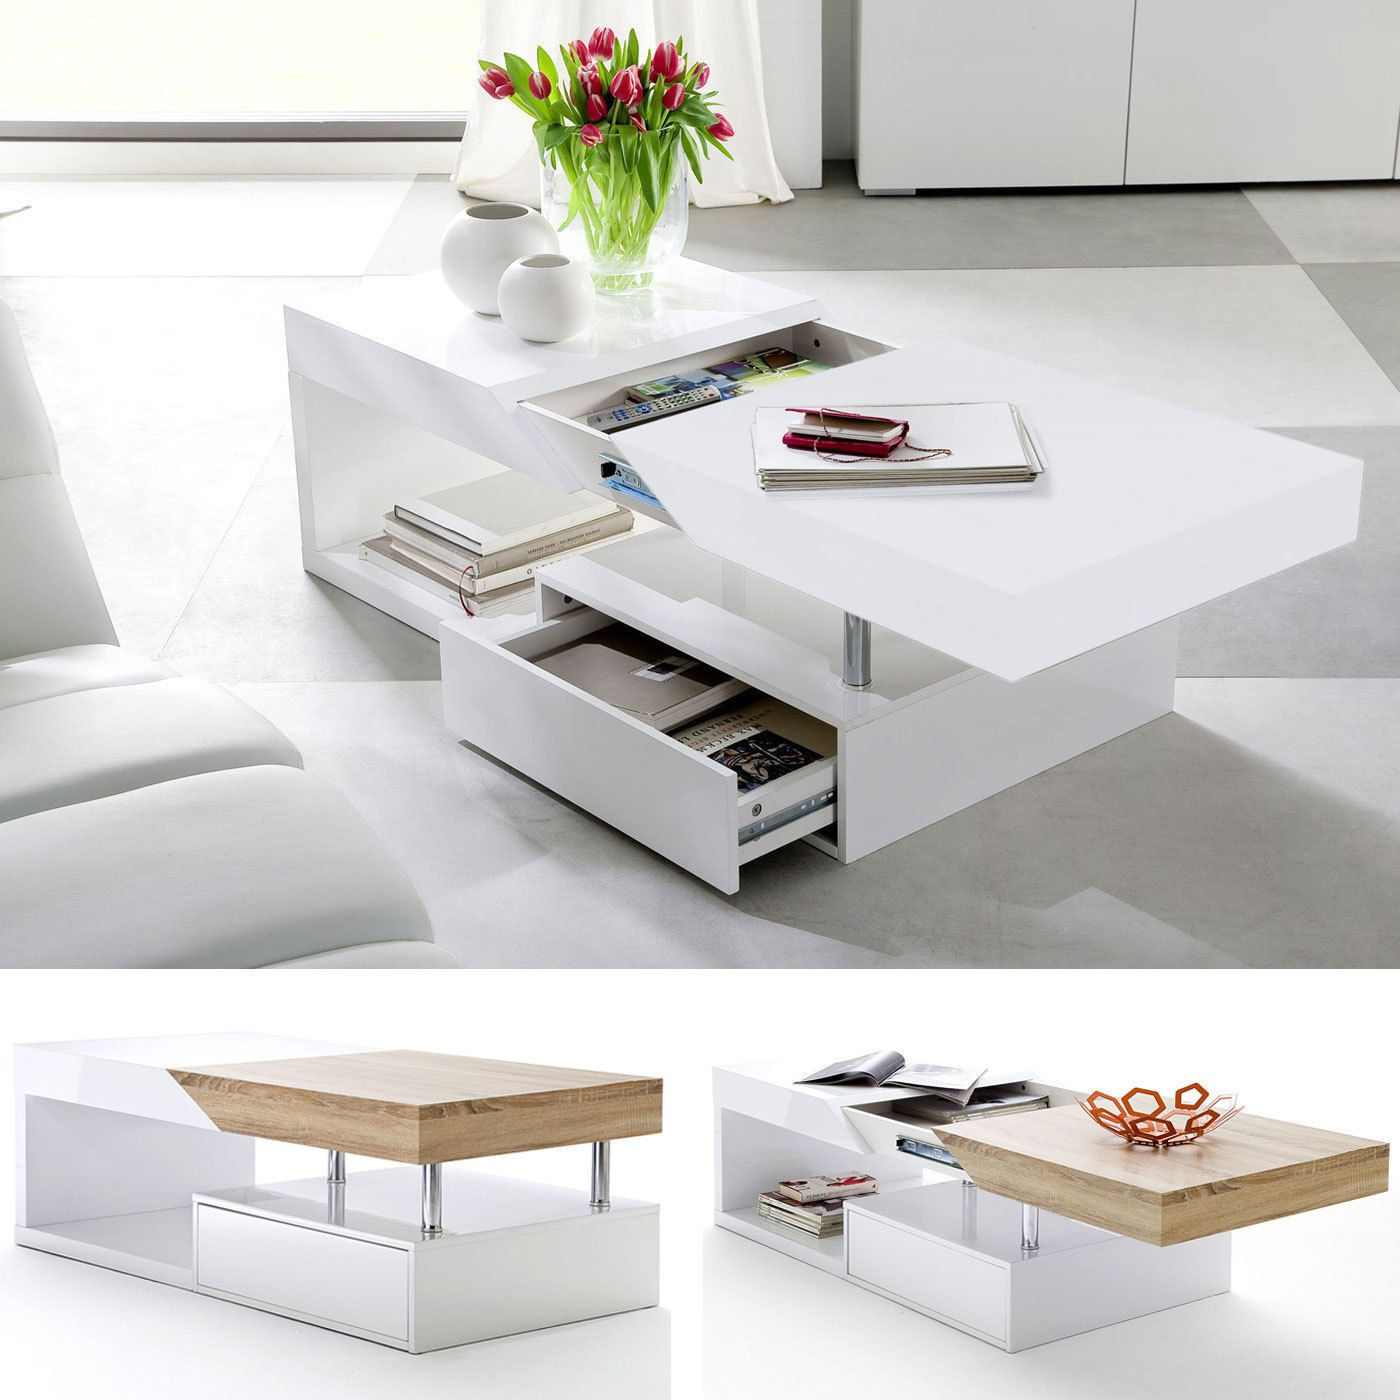 Modanuvo White Black Gloss Oak Extending Storage Coffee Table With Drawer Ebay Coffee Table With Drawers Coffee Table Coffee Table White [ 1400 x 1400 Pixel ]